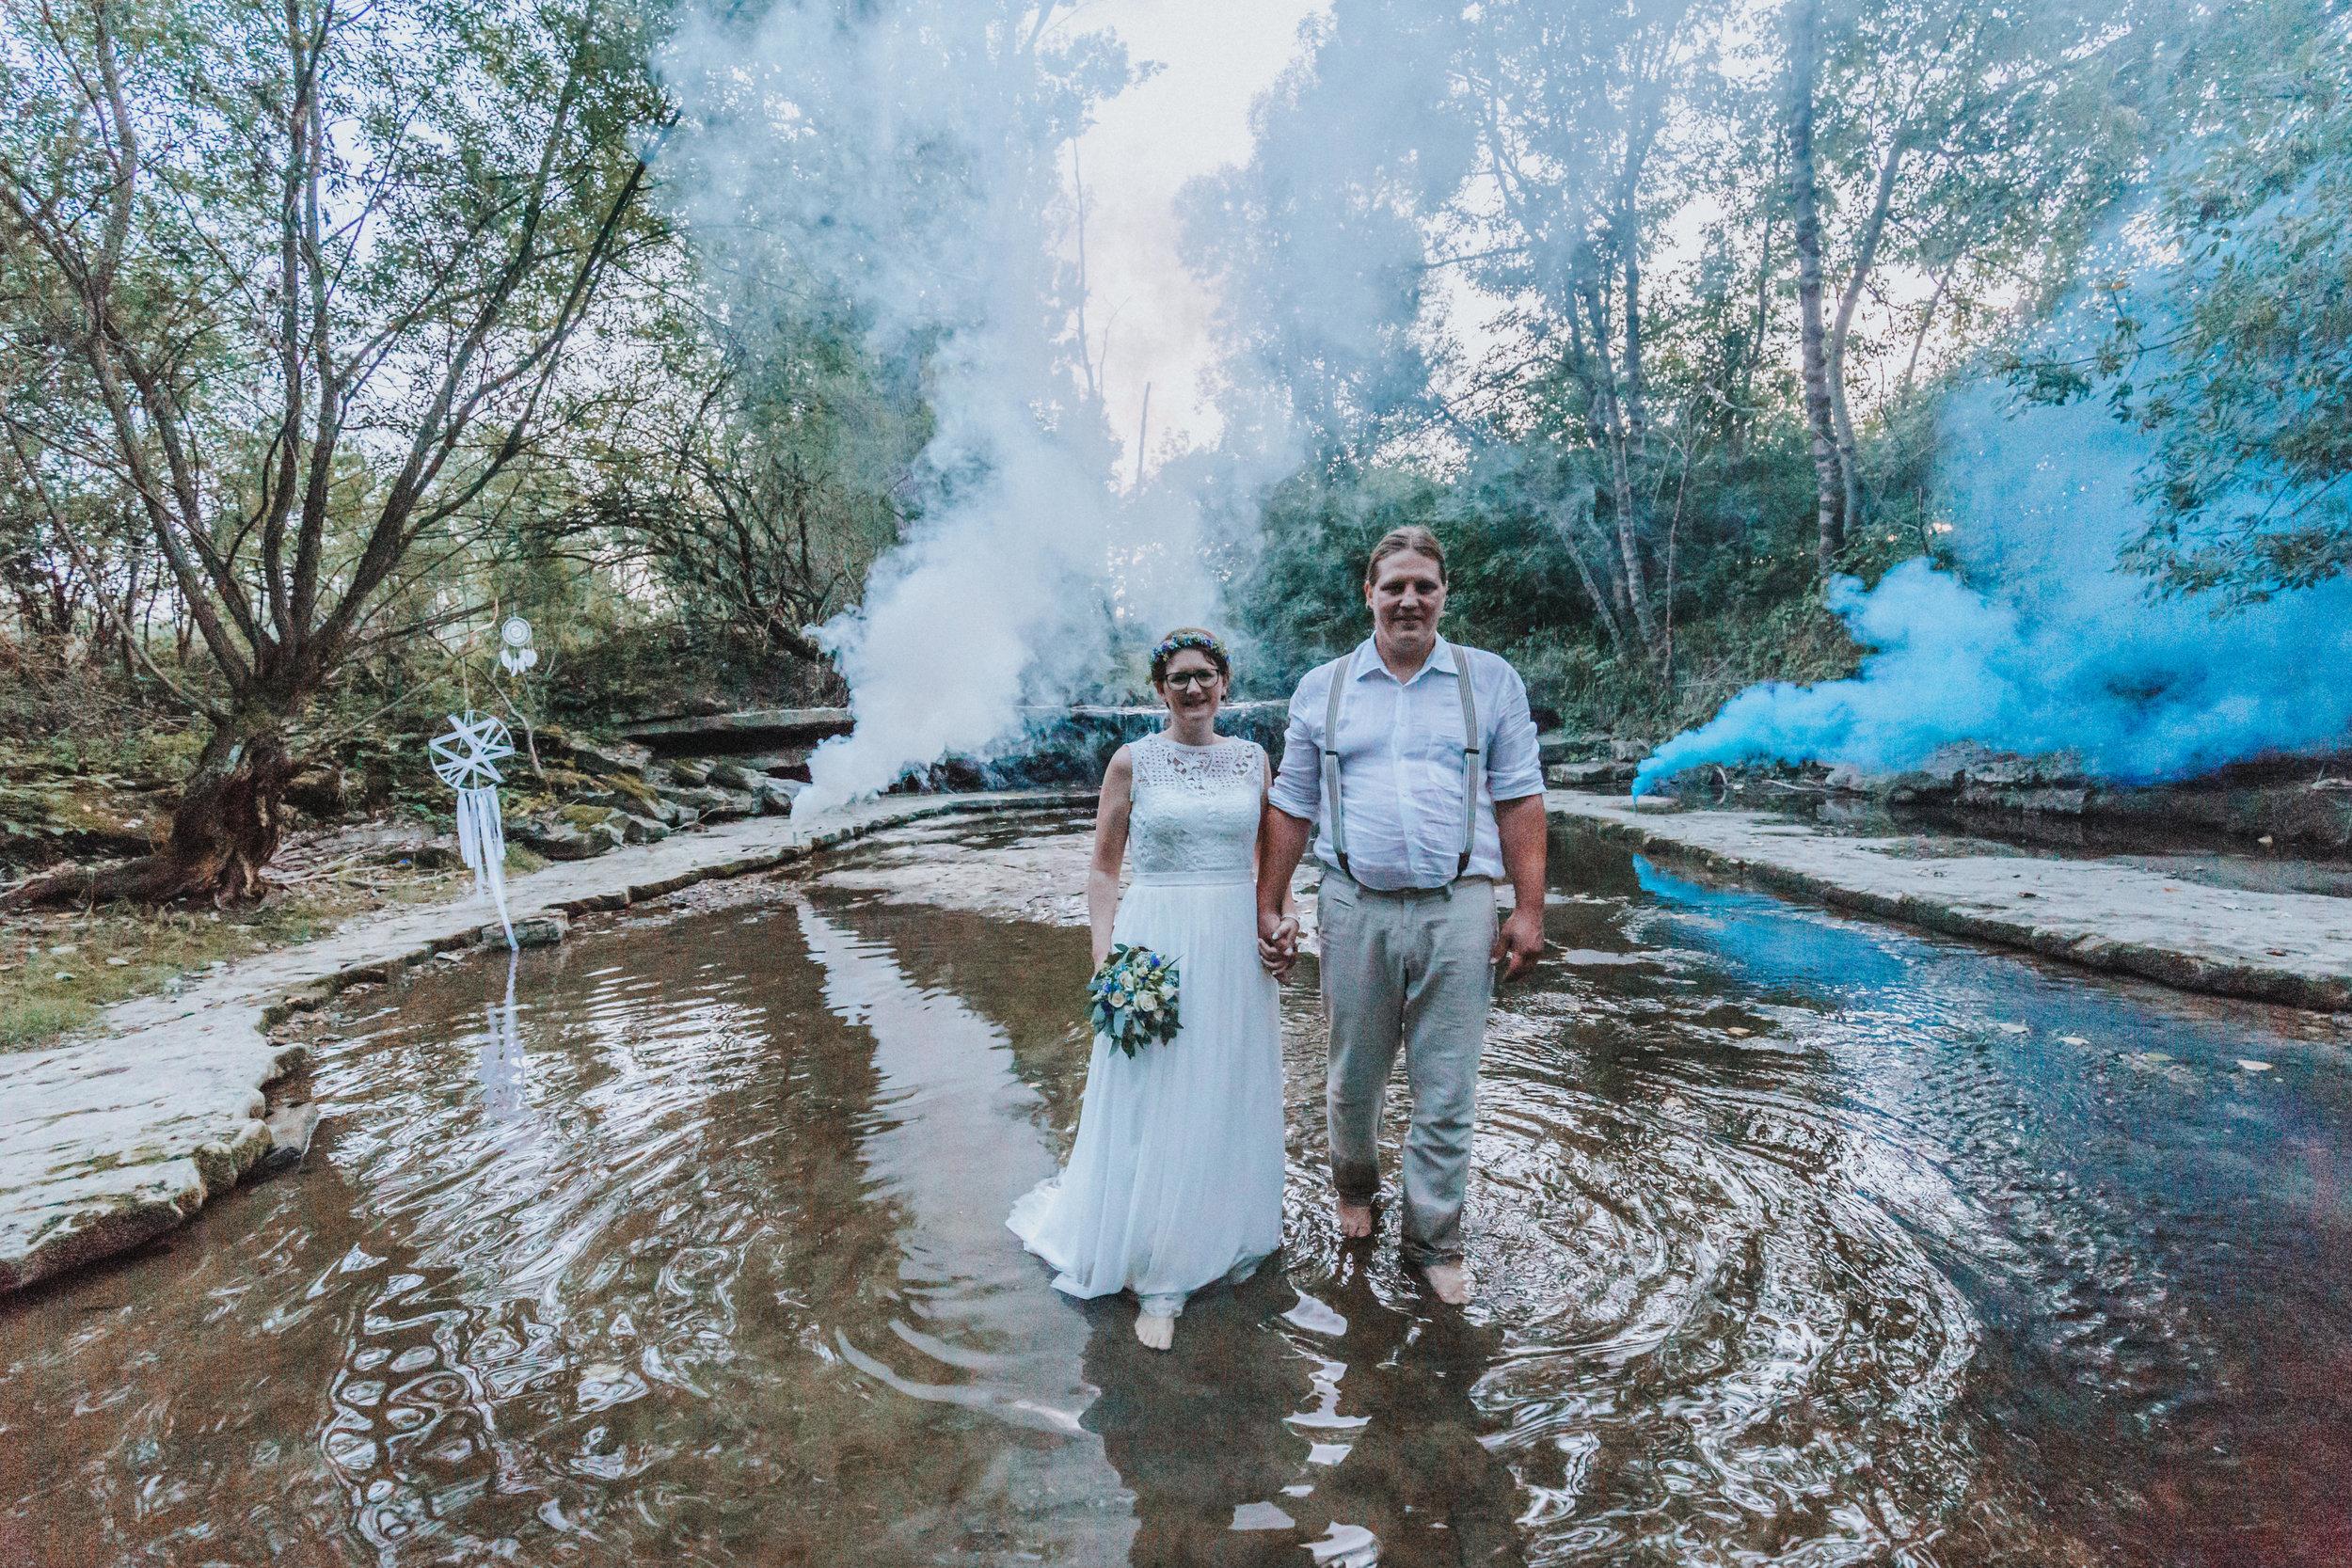 yessica-baur-fotografie-after-wedding-tübingen-132-1407.JPG